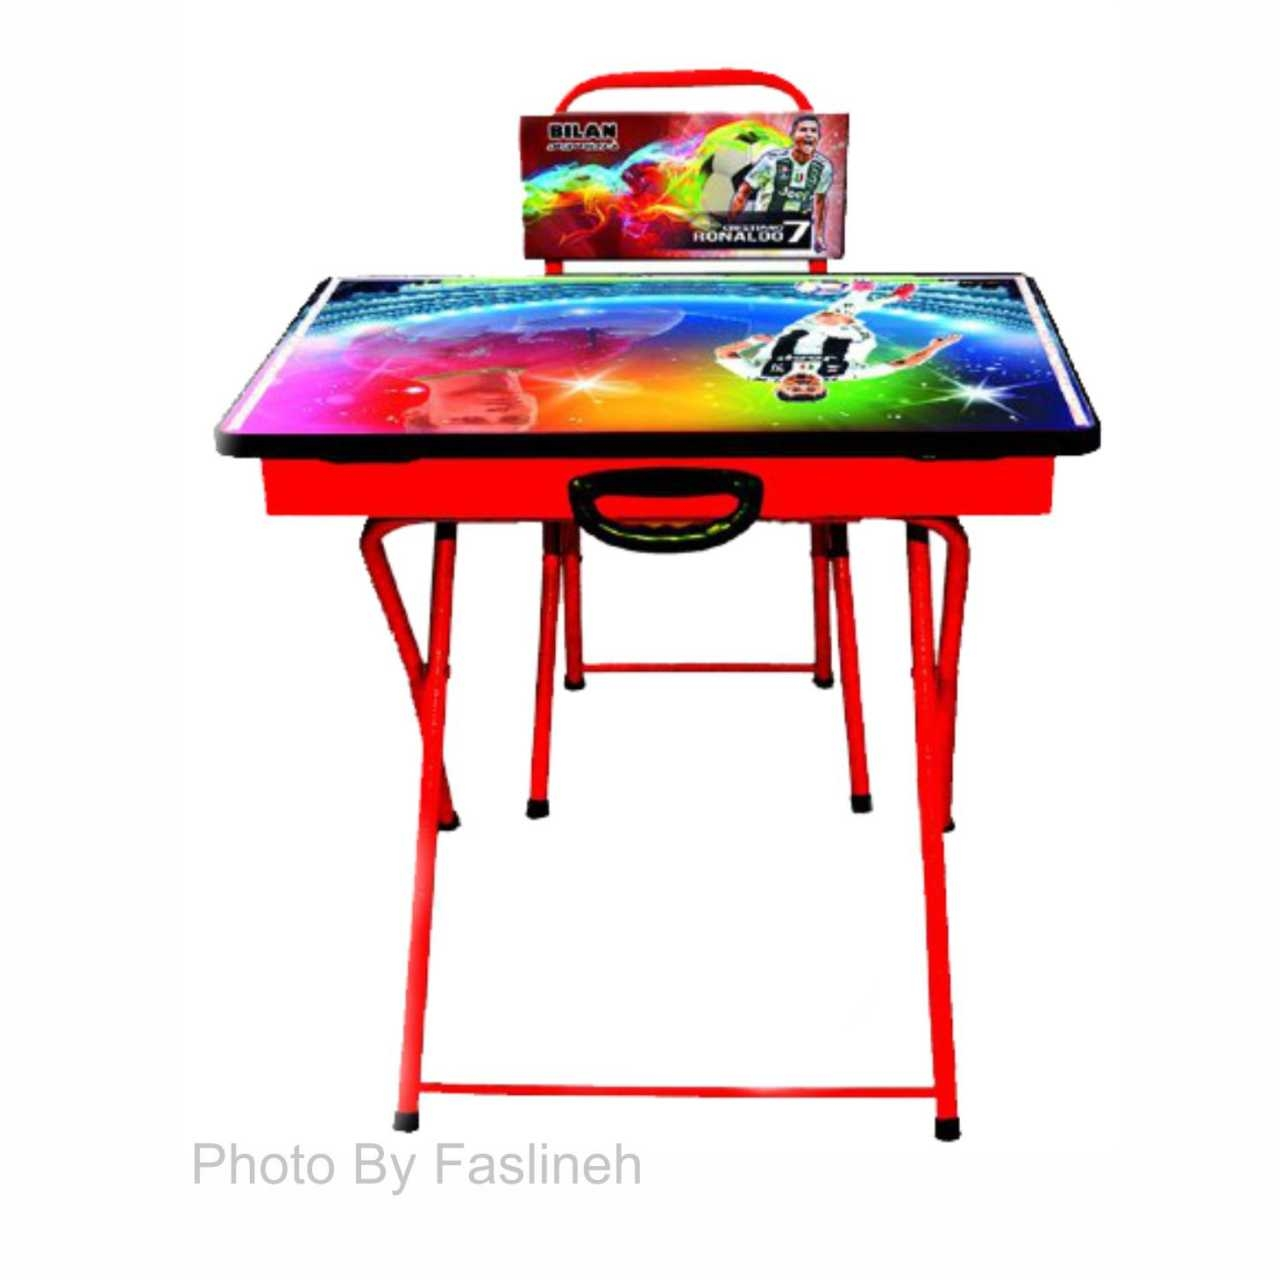 میز و صندلی تحریر تاشو بیلن مدل M2  رونالدو پسرانه